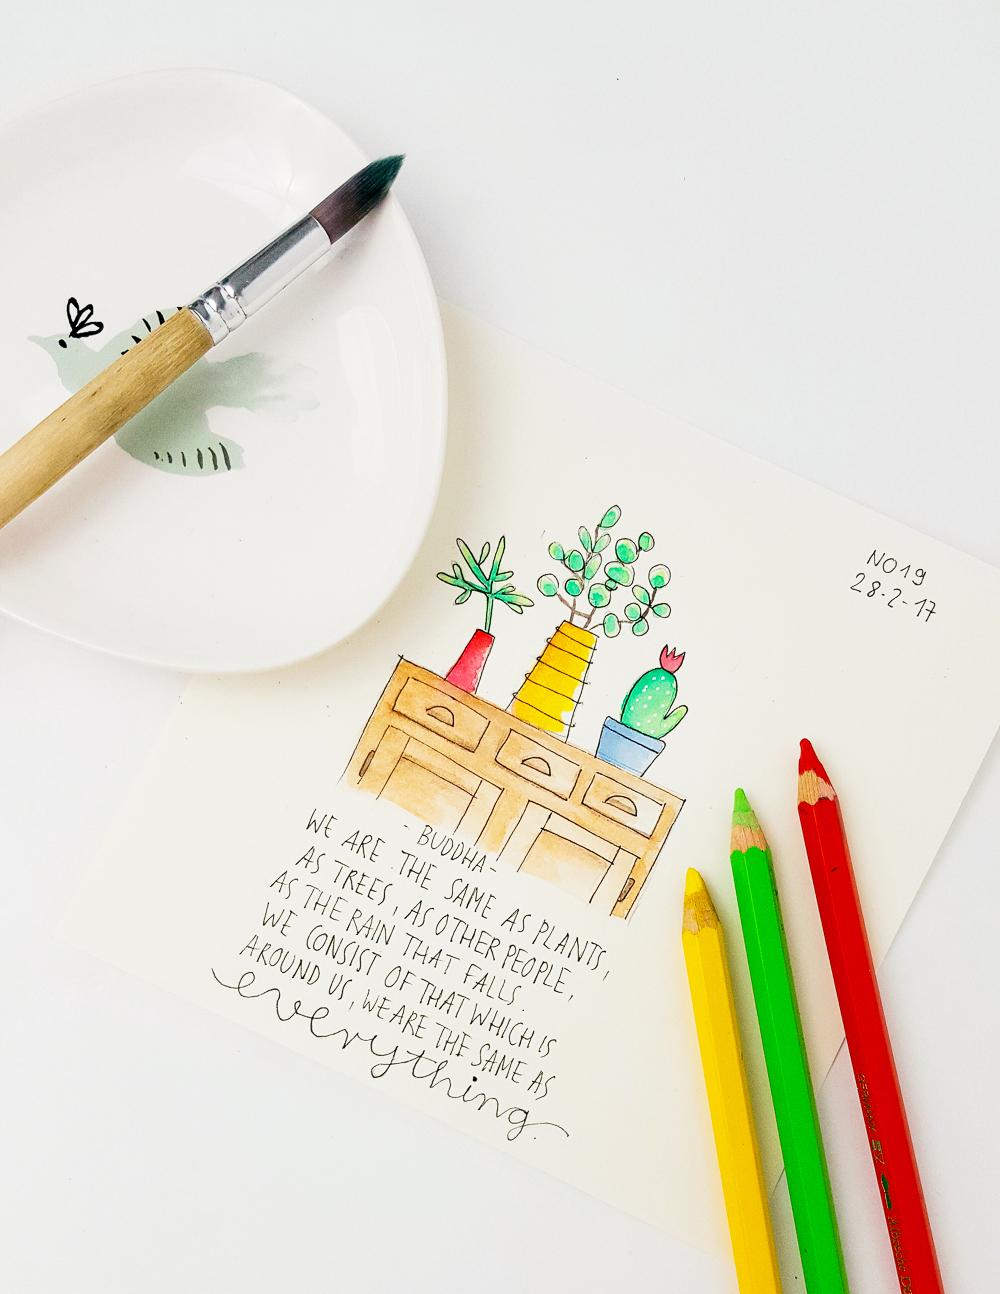 Zitate in Aquarell - die 30 Tage Herausforderung (Teil 2) - Janna Werner